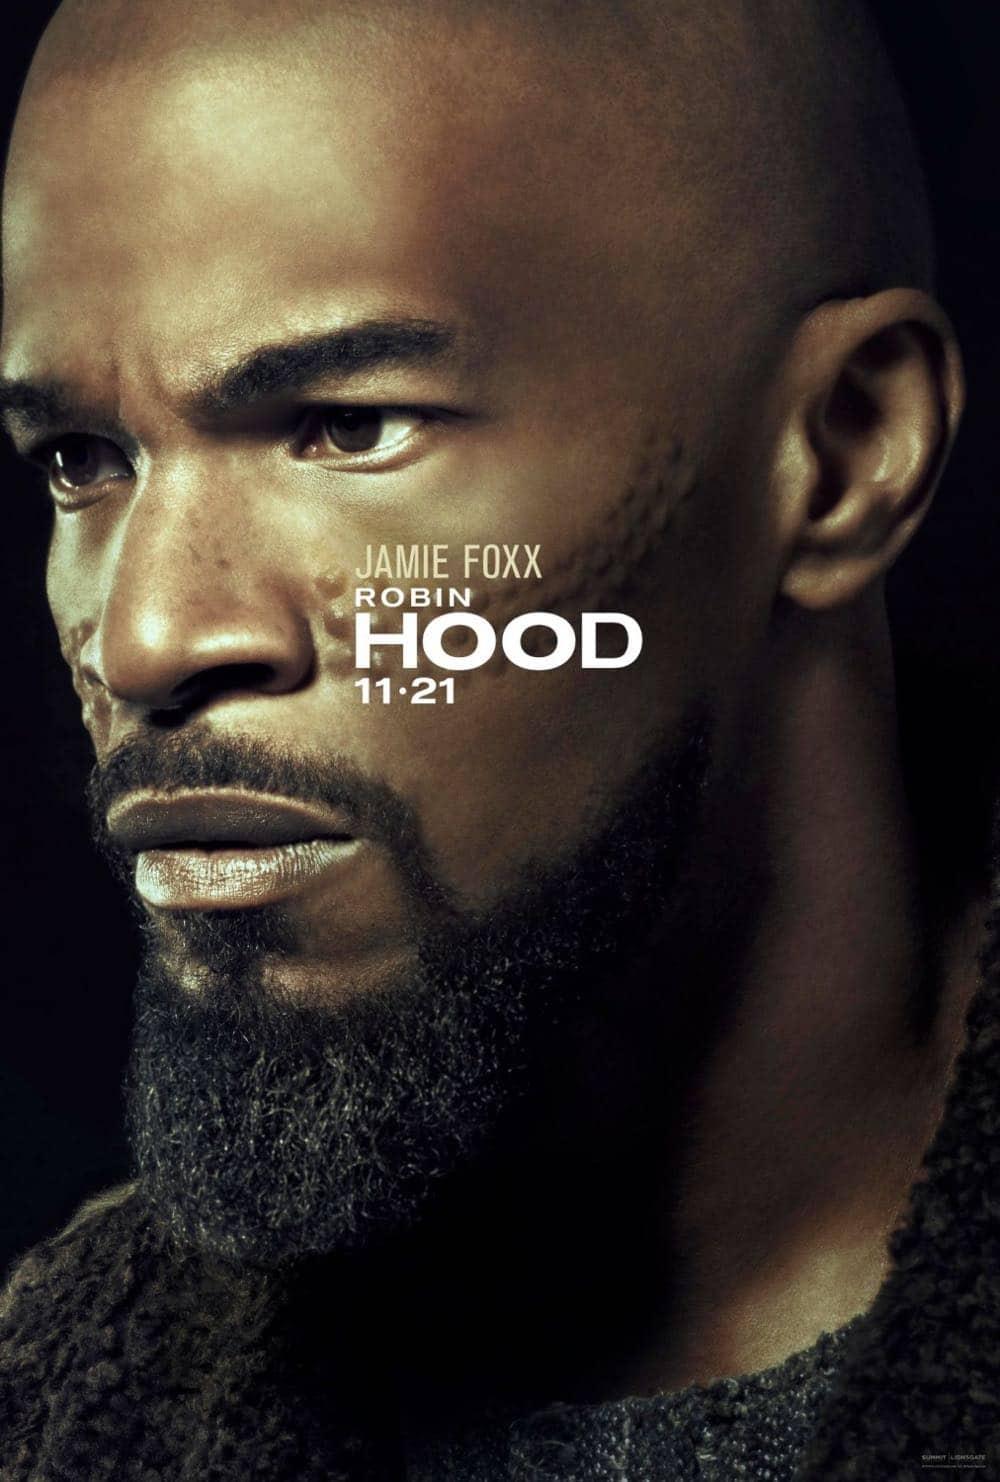 Robin Hood 2018 Poster Jamie